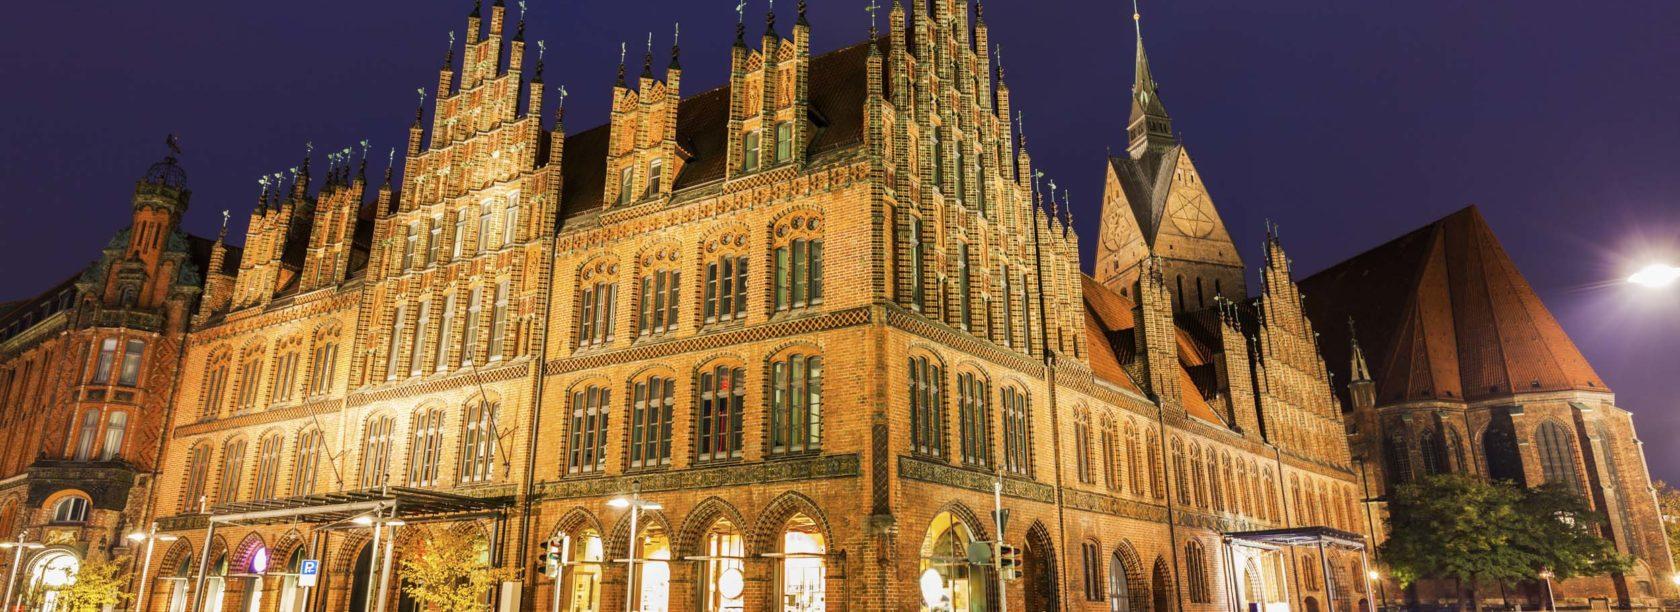 Corona-Soforthilfe in Niedersachsen